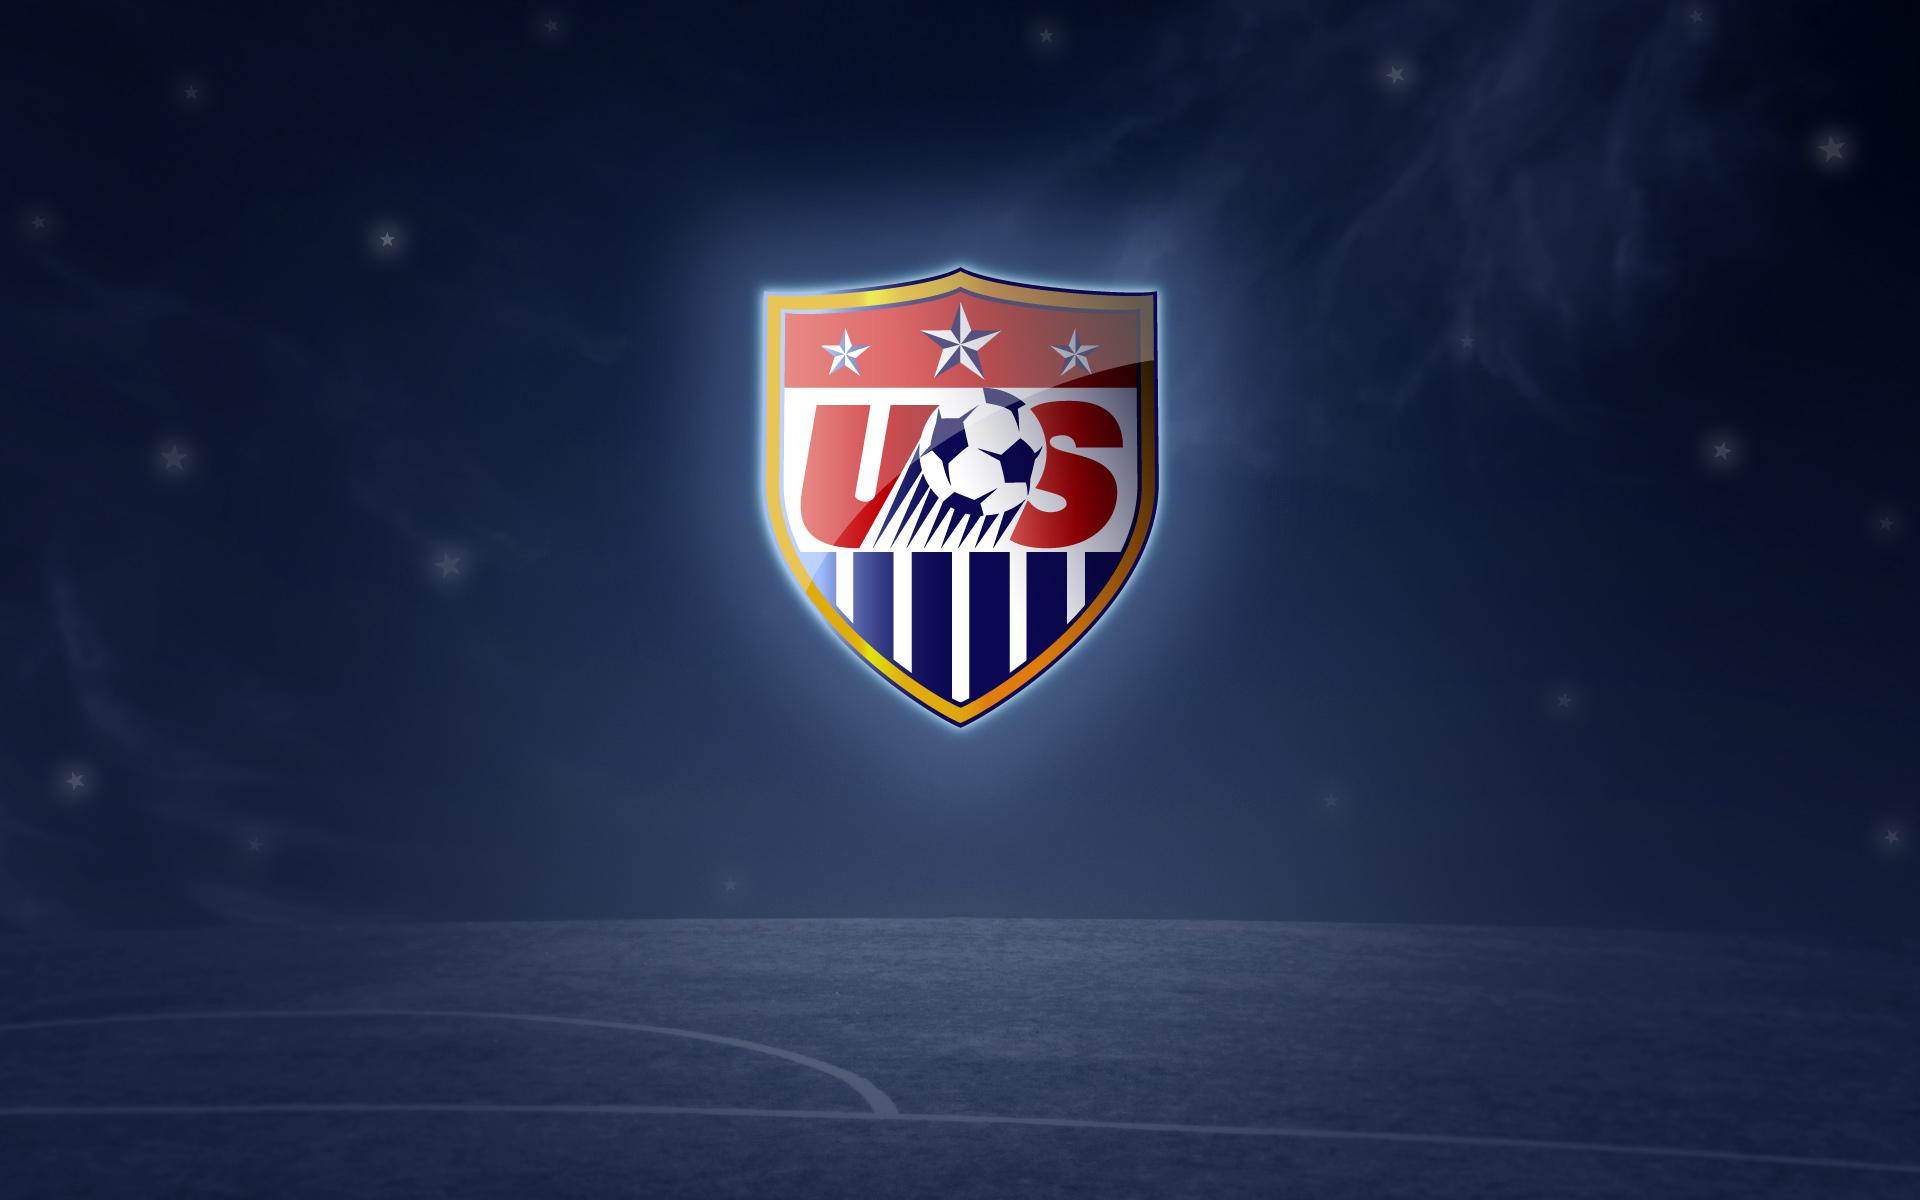 USA World Cup Wallpapers USA World Cup Myspace Backgrounds USA World 1920x1200